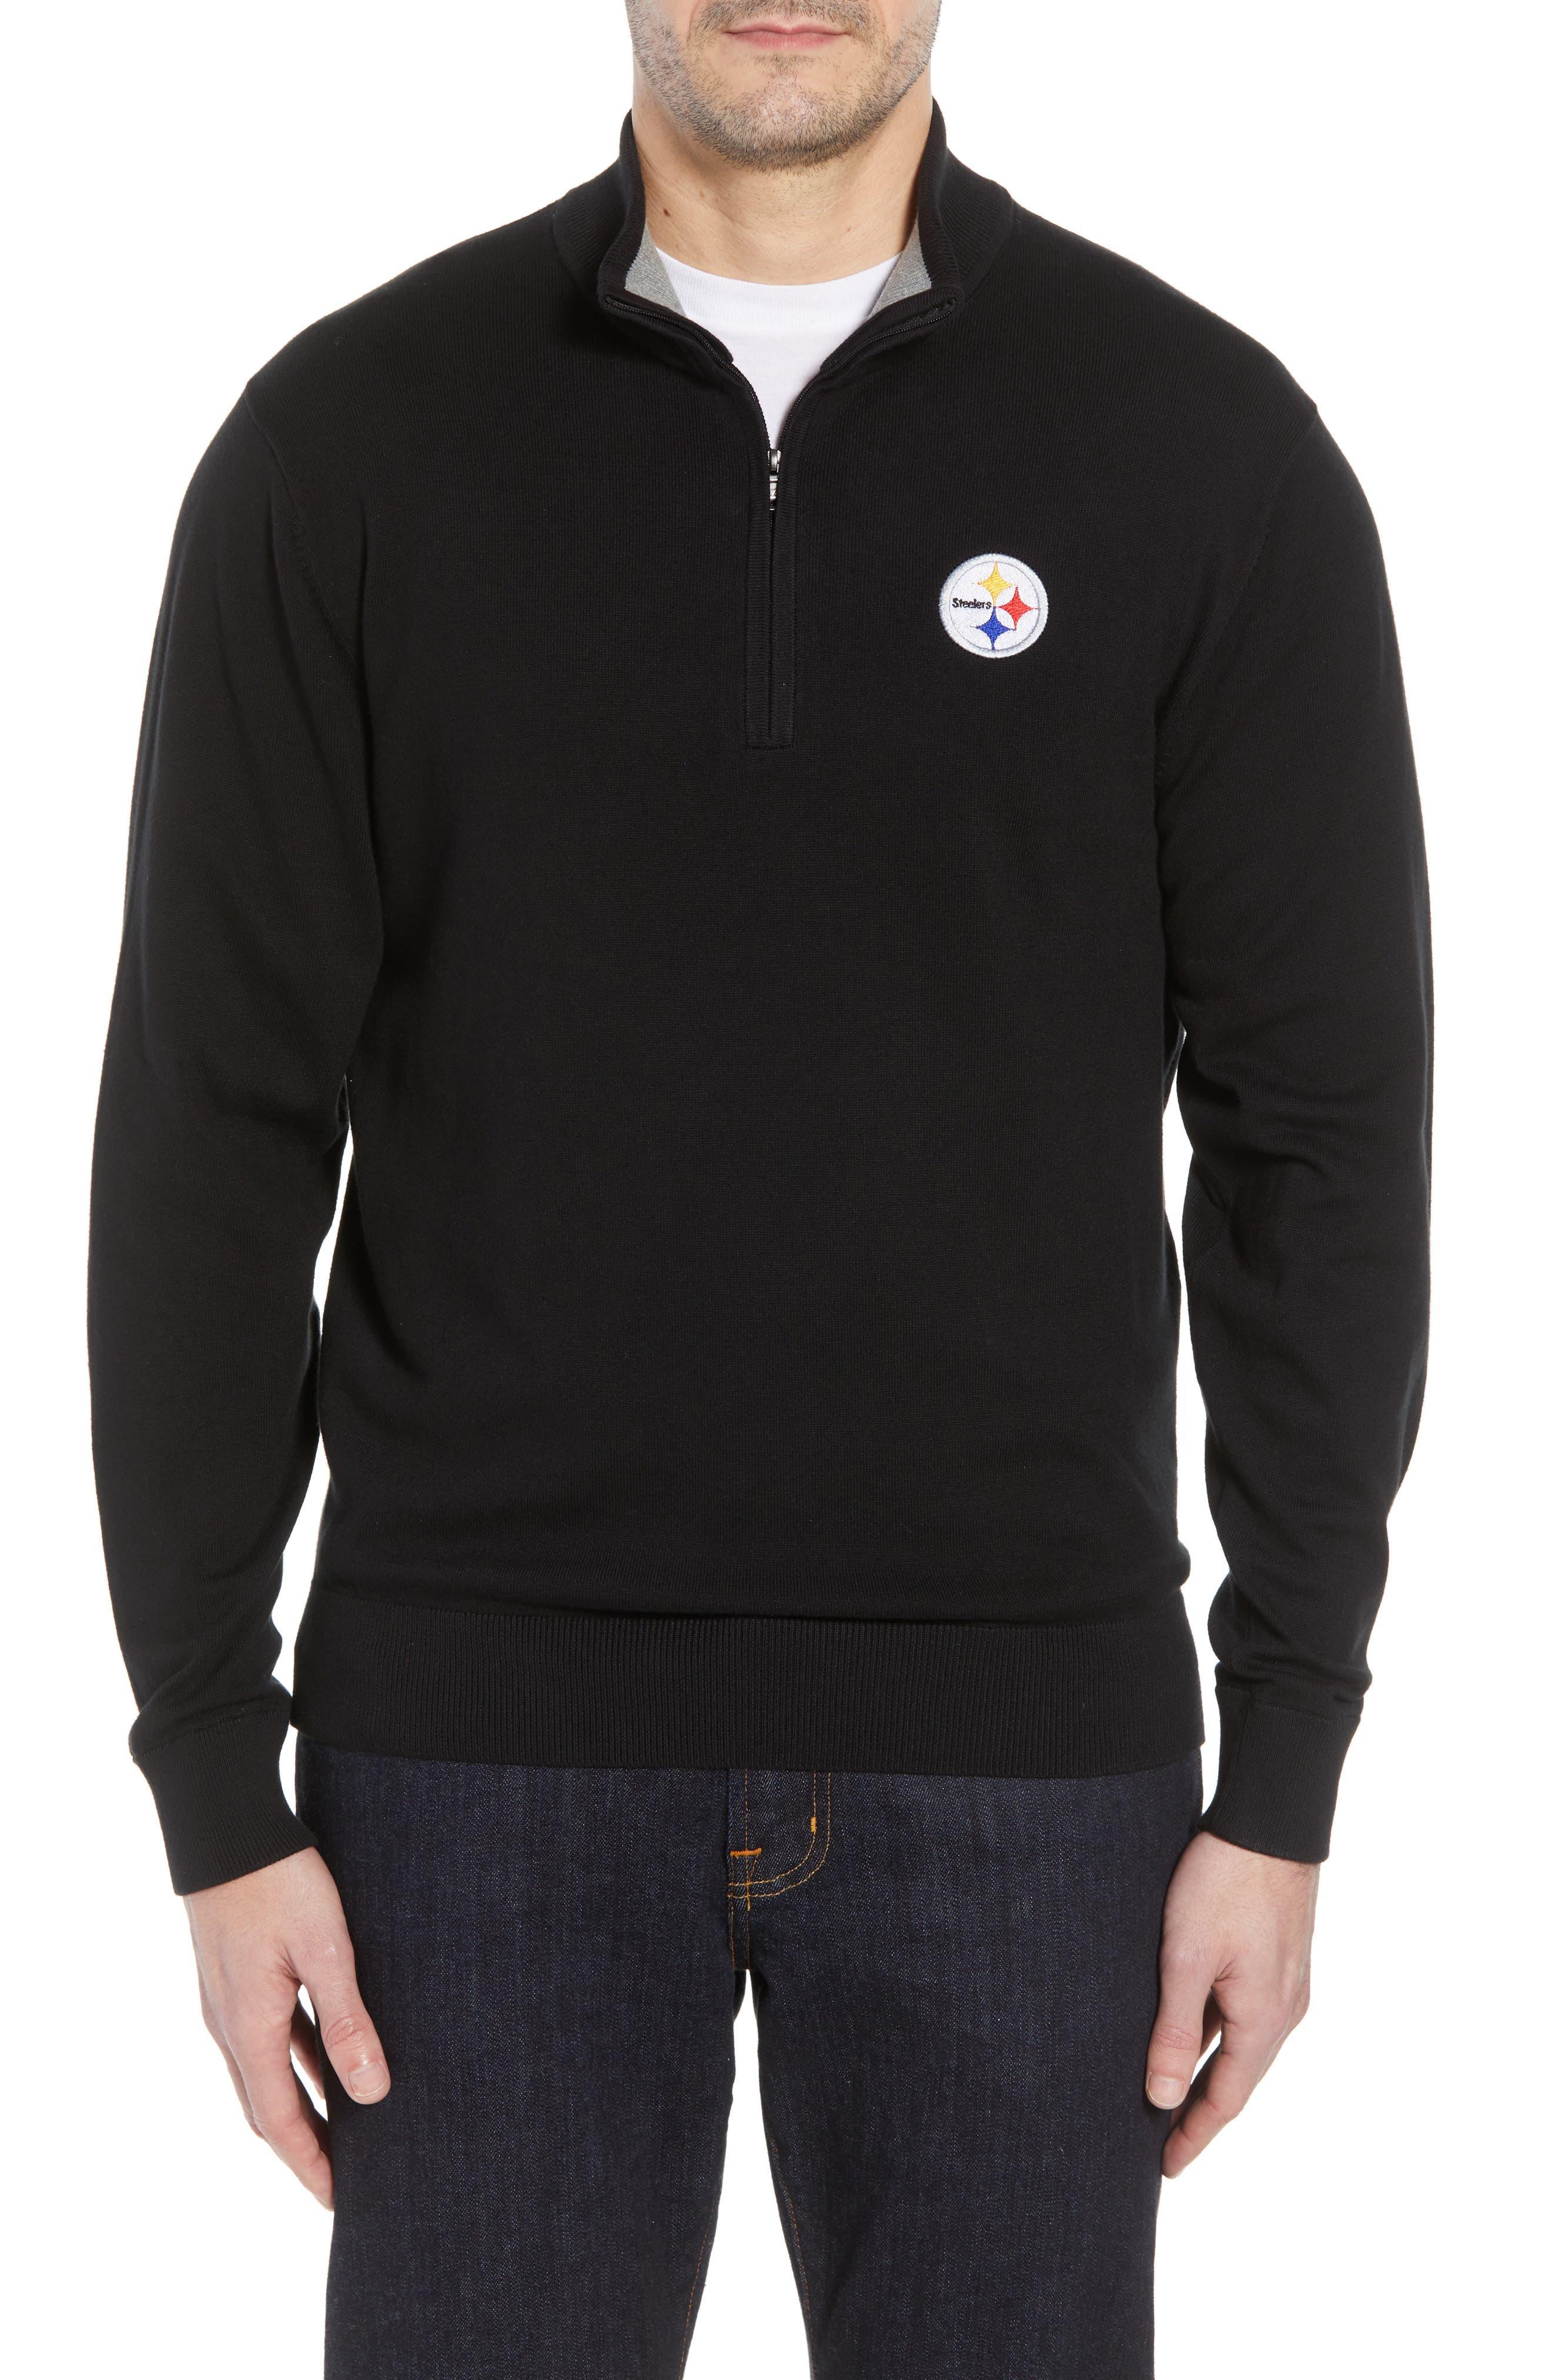 Pittsburgh Steelers - Lakemont Regular Fit Half Zip Sweater,                             Main thumbnail 1, color,                             001